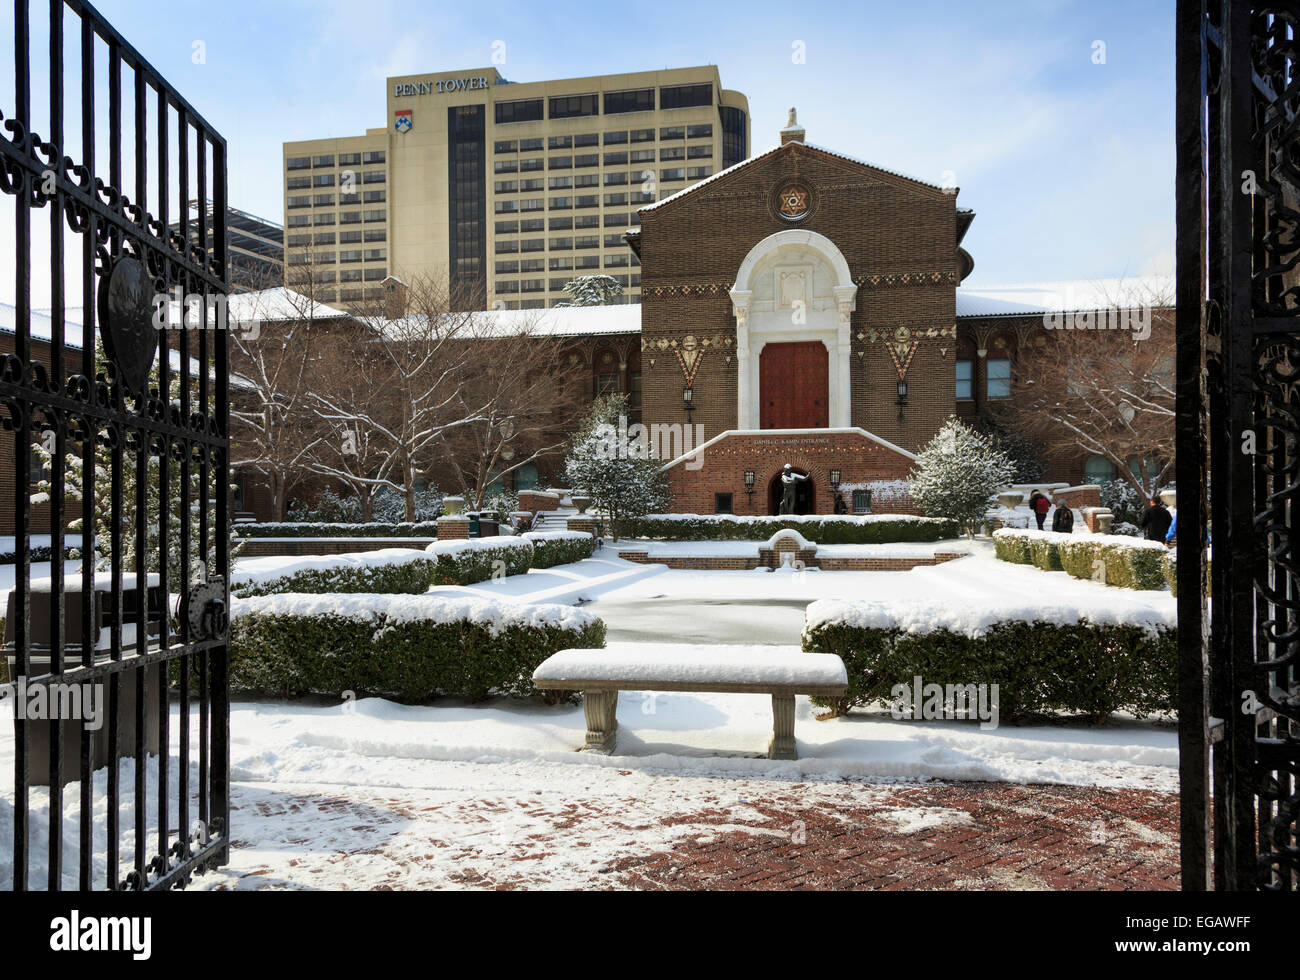 University of Pennsylvania Museum of Archaeology and Anthropology in winter, Philadelphia, Pennsylvania, USA - Stock Image